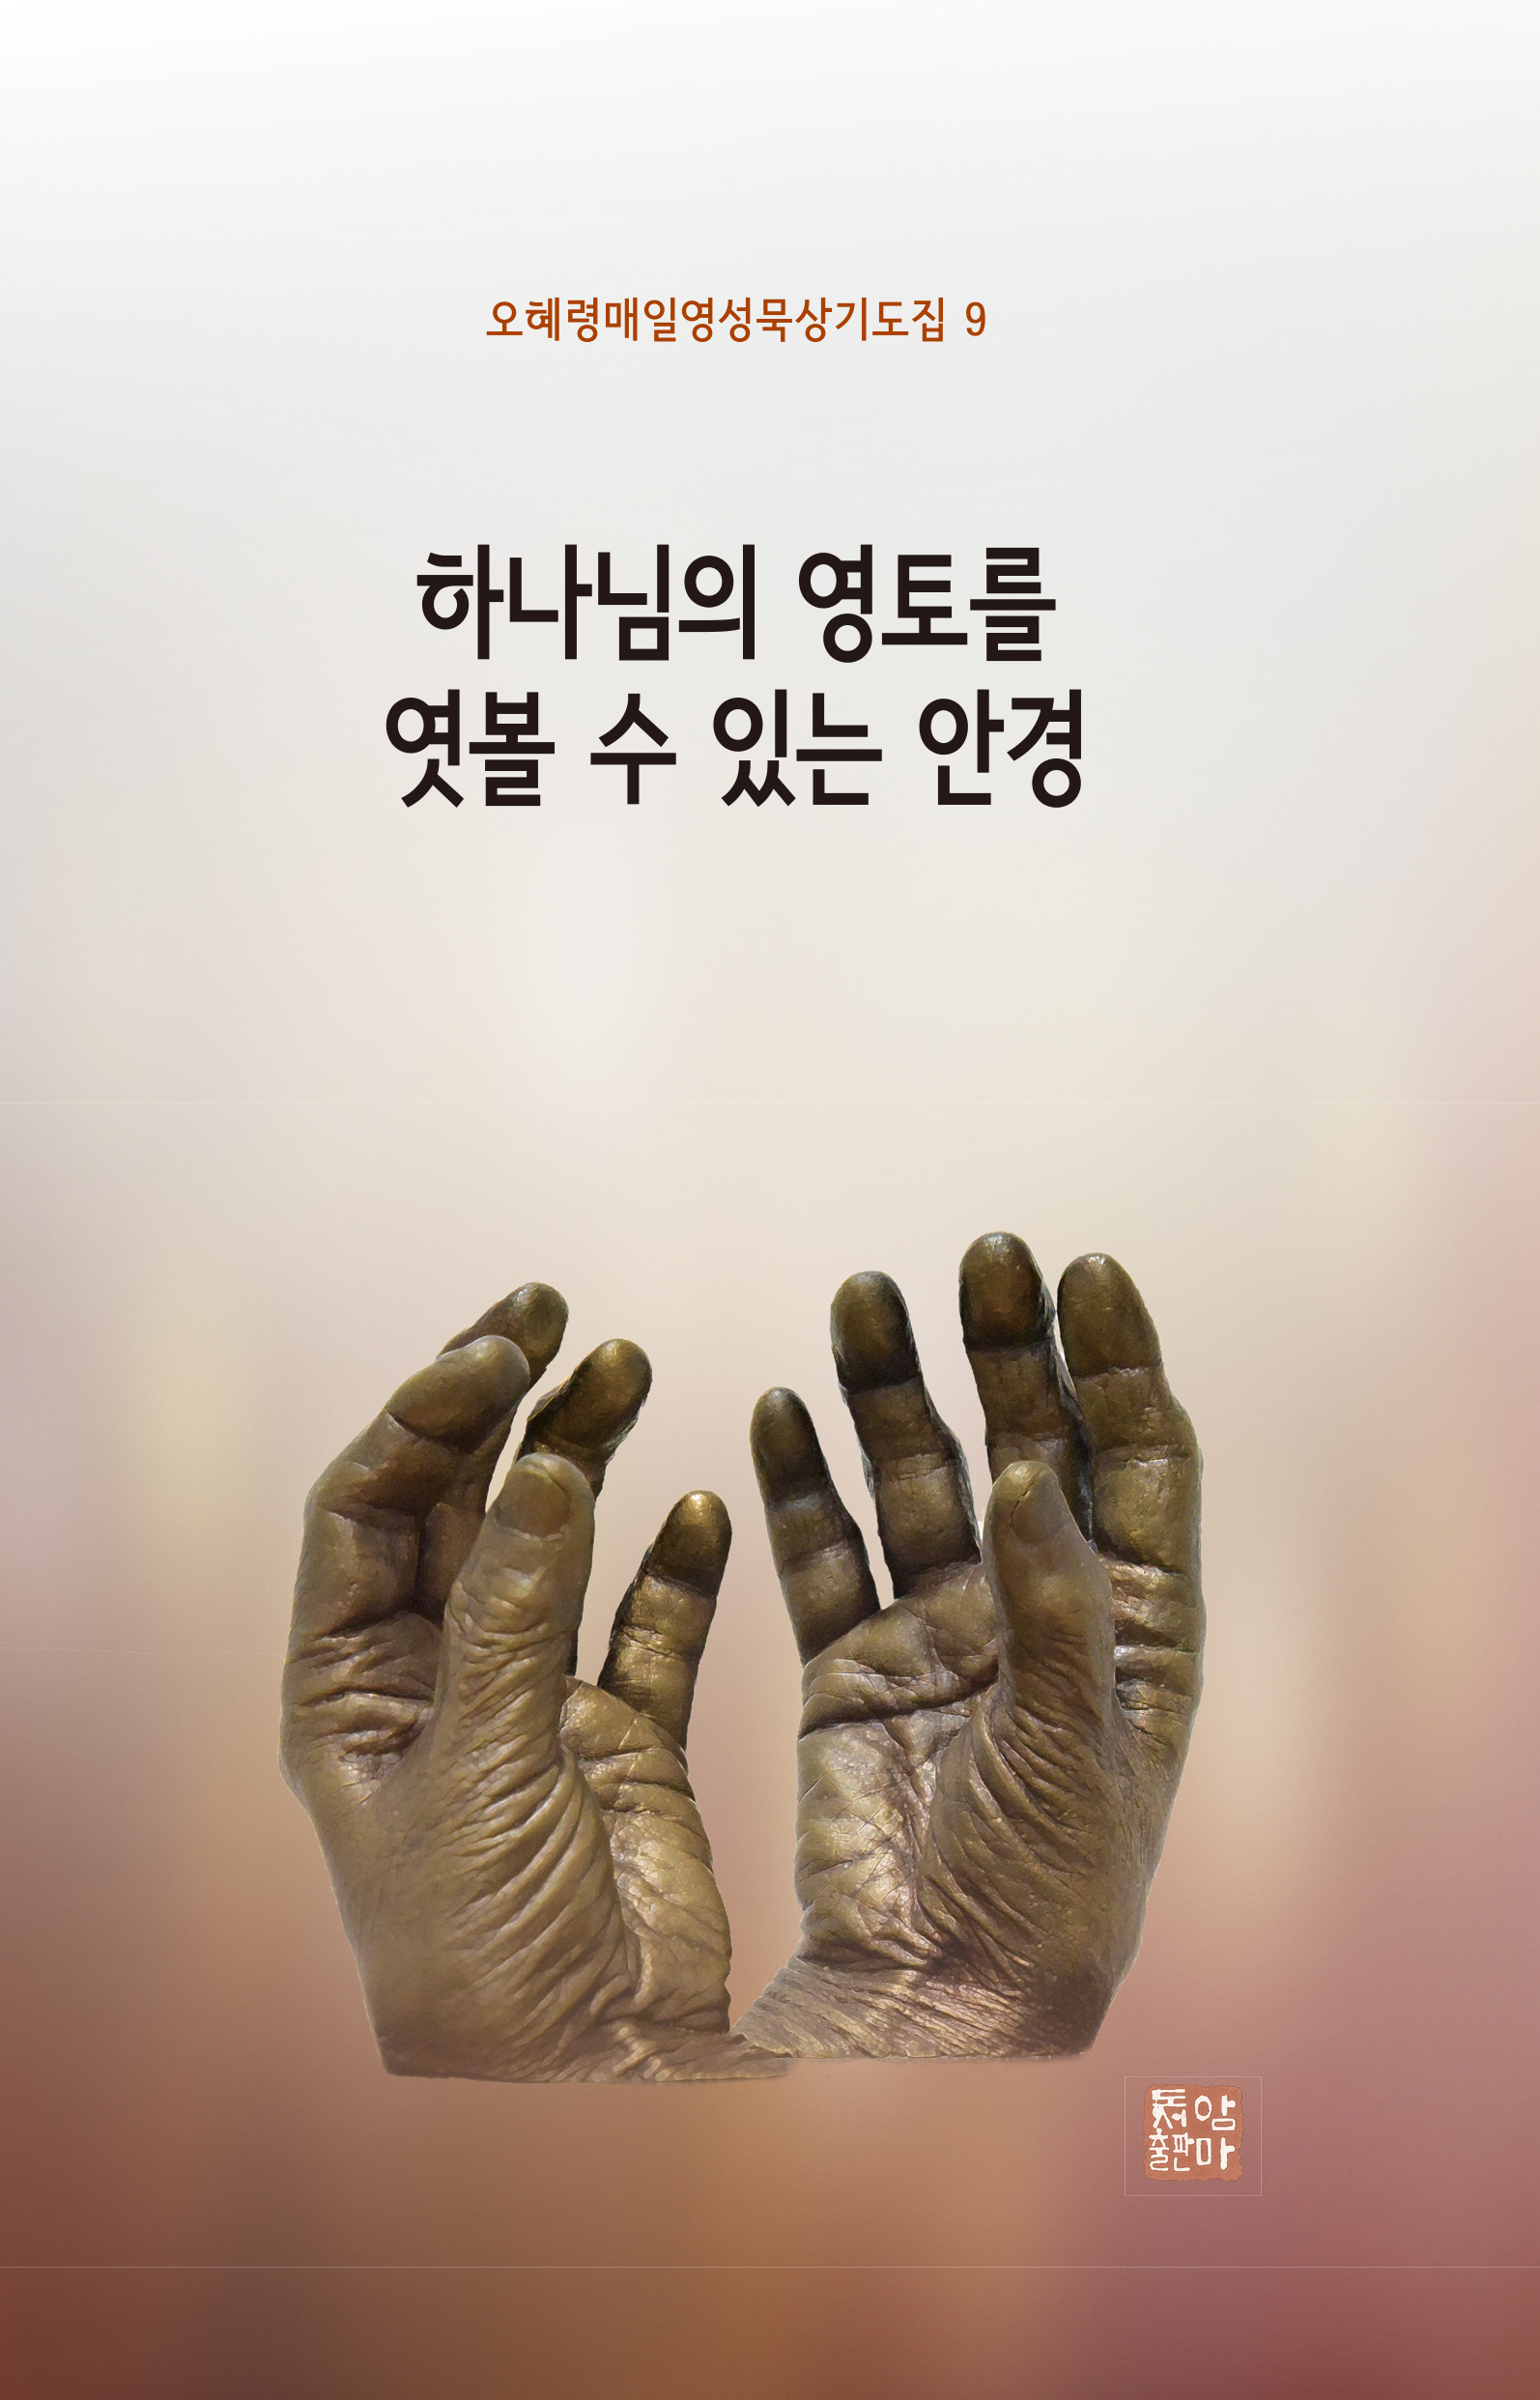 book67+하나님의+영토를+엿볼+수+있는+안경.jpg